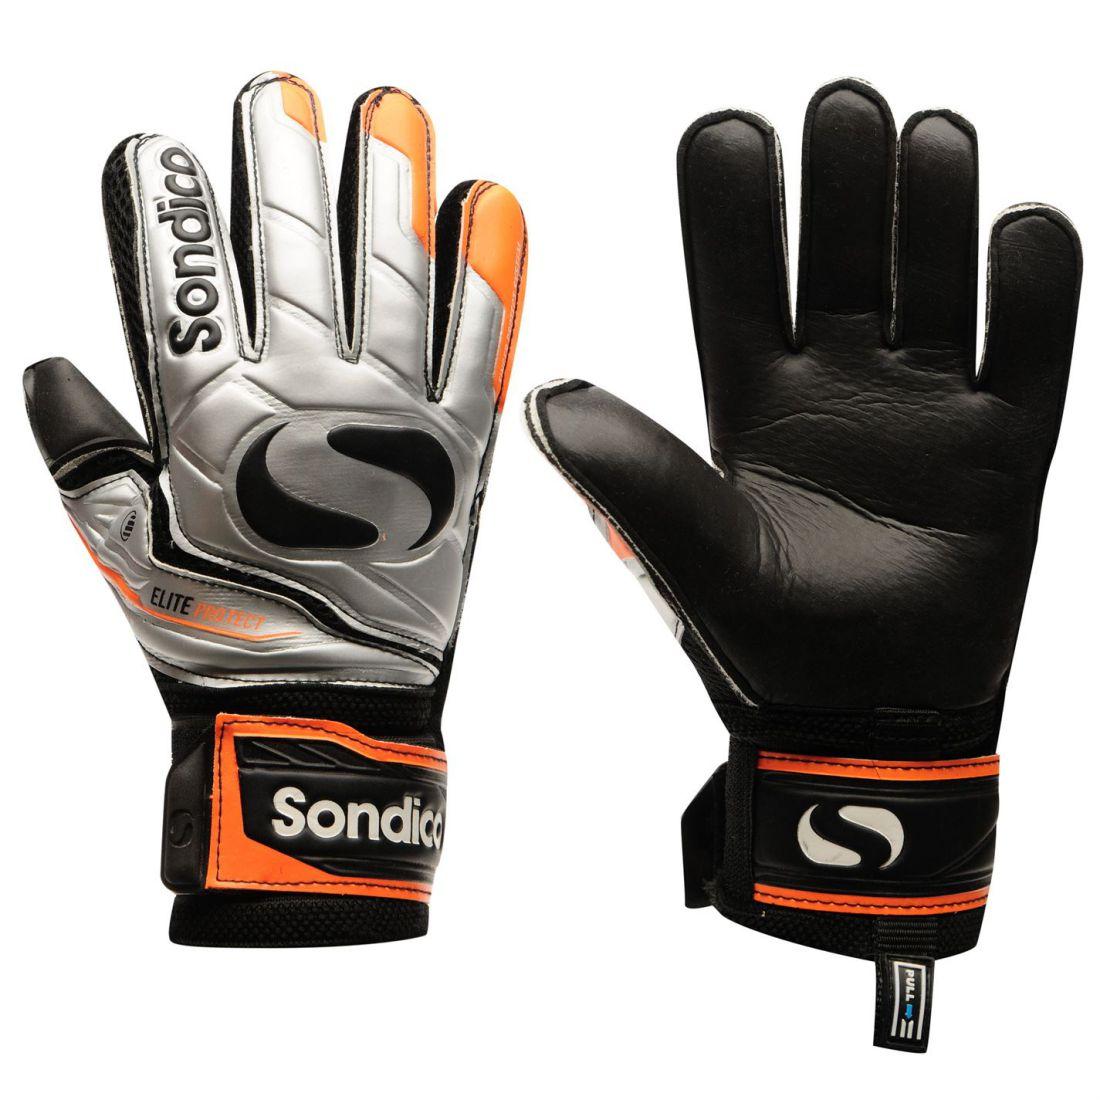 84c0821ab8b Sondico-Mens-EliteProtect-Goalkeeper-Gloves-Football-Training-Sports-